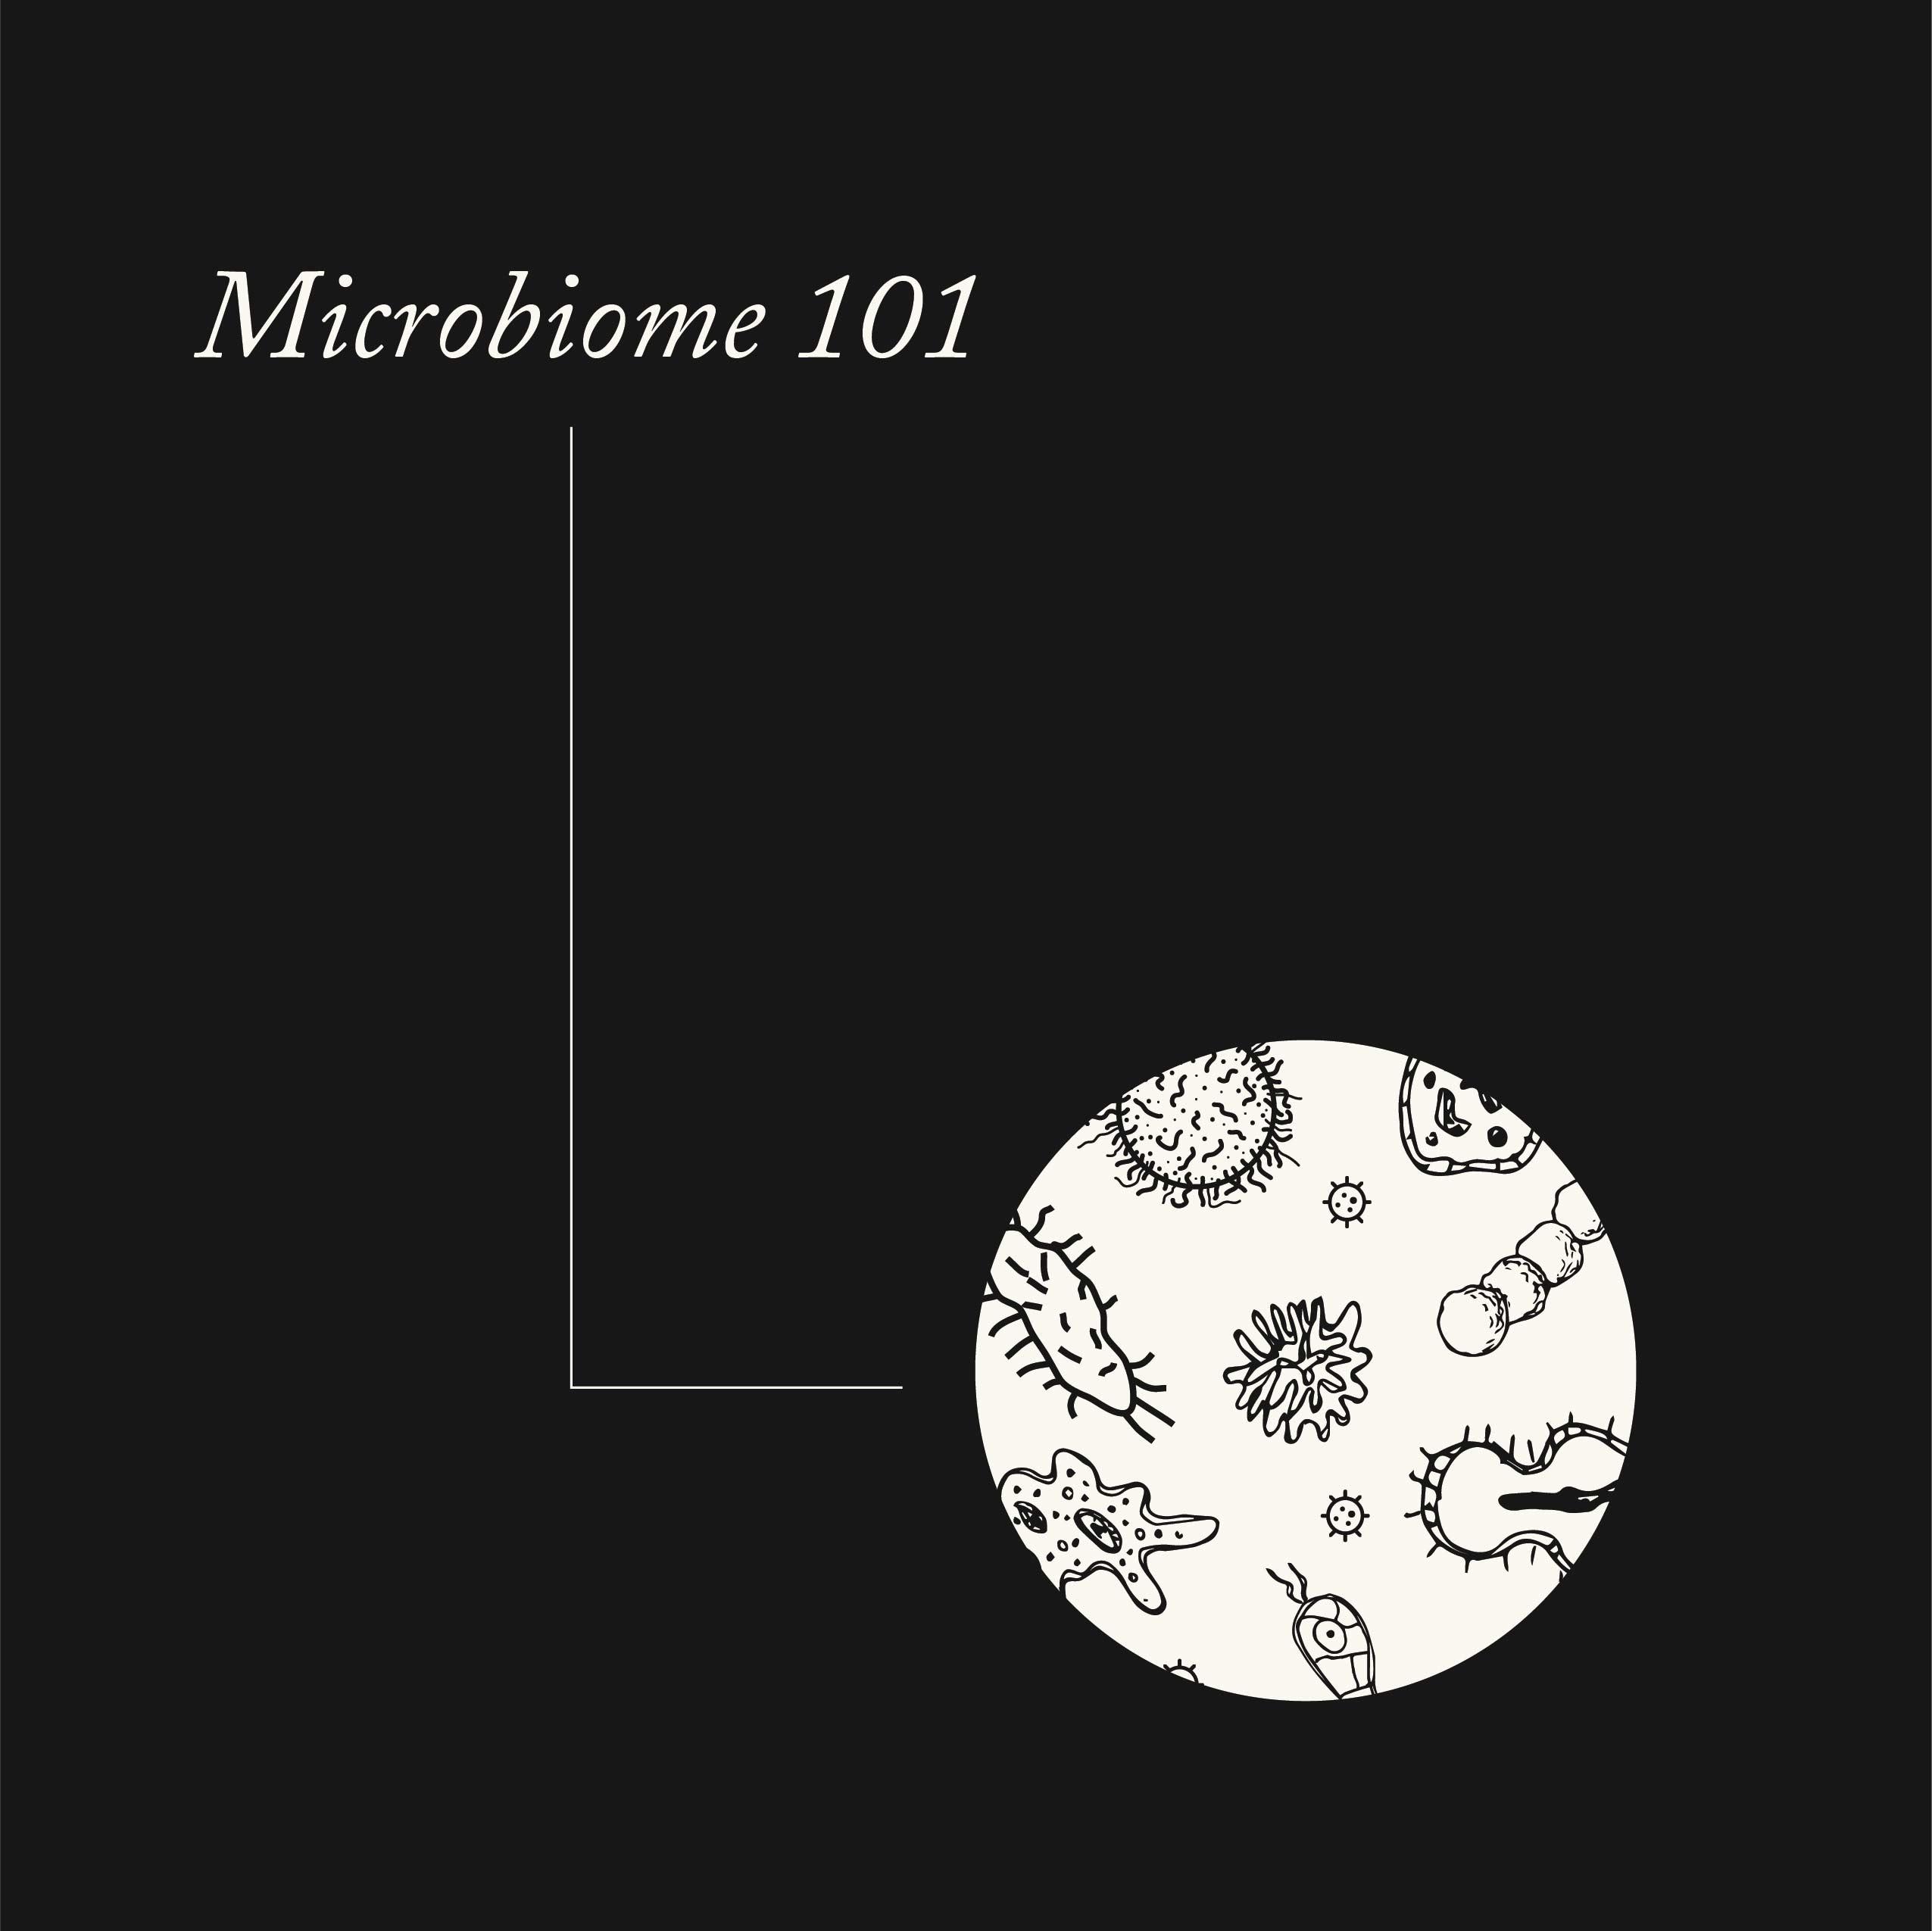 Microbiome 101